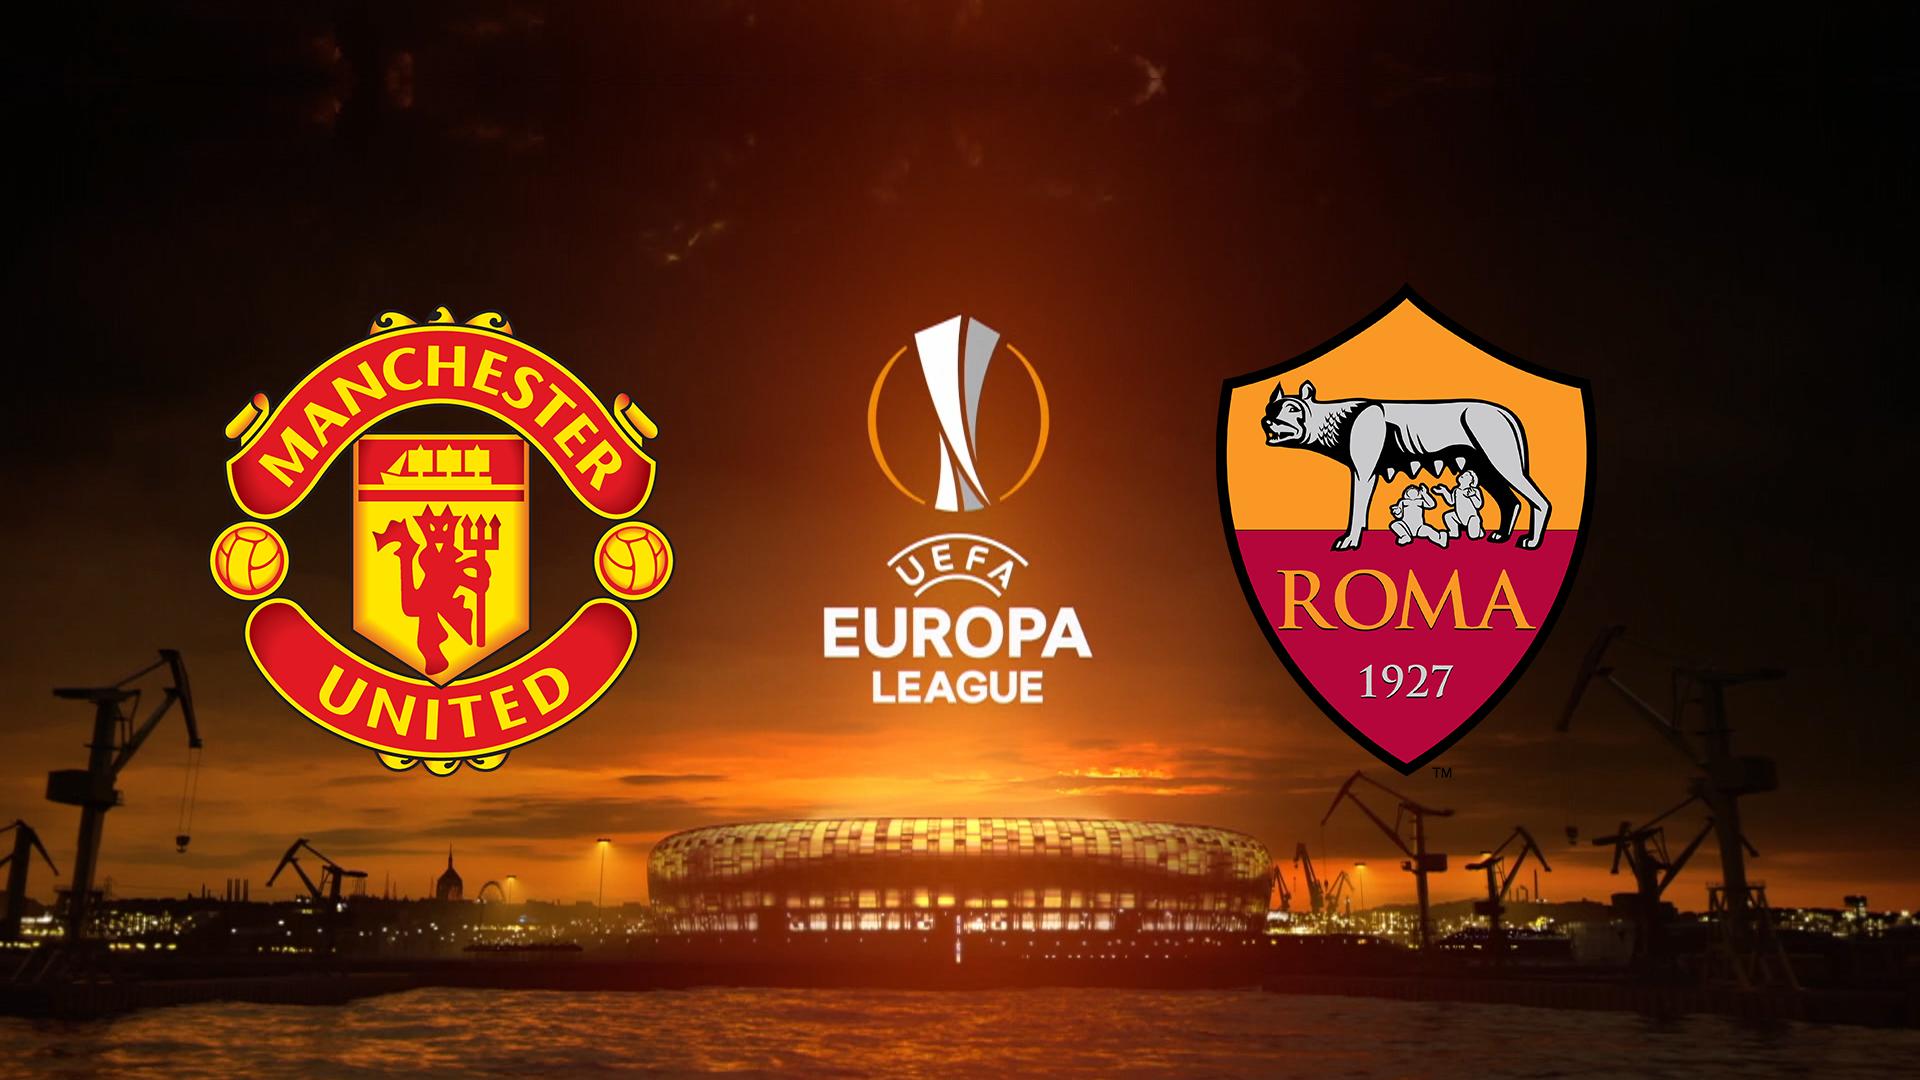 Europa League, Manchester United – Roma, formacionet e mundshme